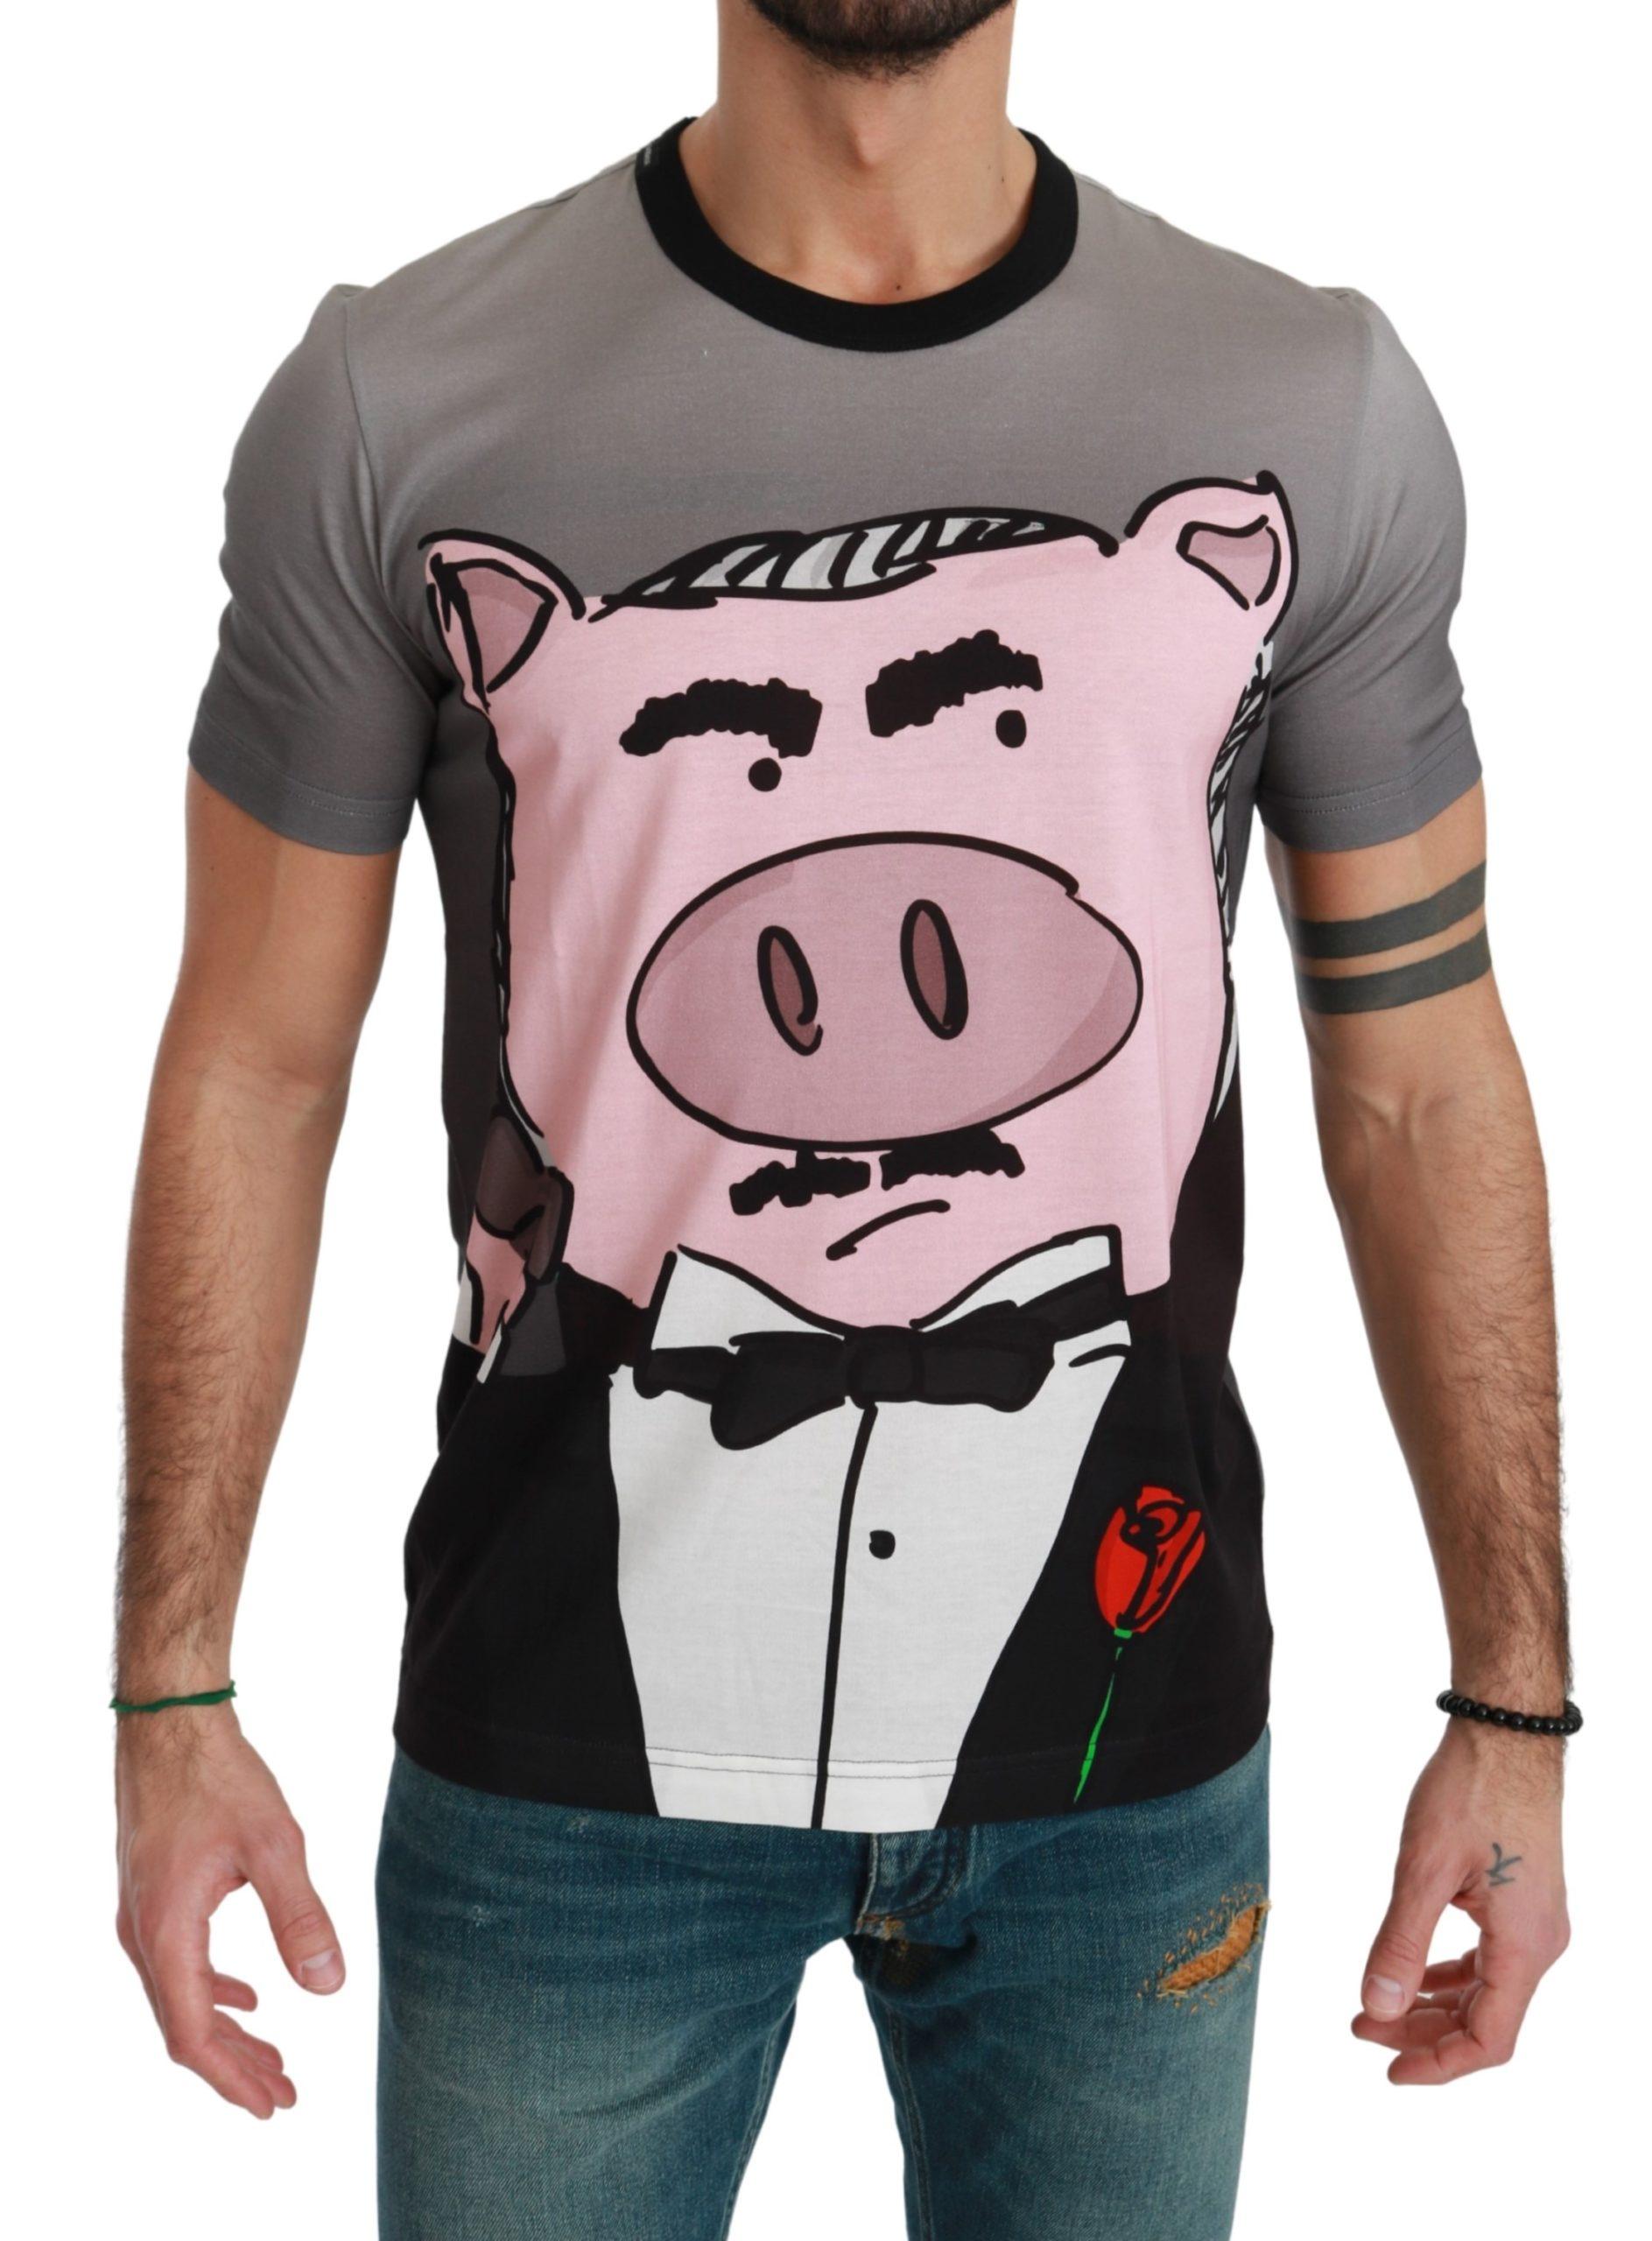 Dolce & Gabbana Men's Cotton Pig T-Shirt Gray TSH4551 - IT44   XS